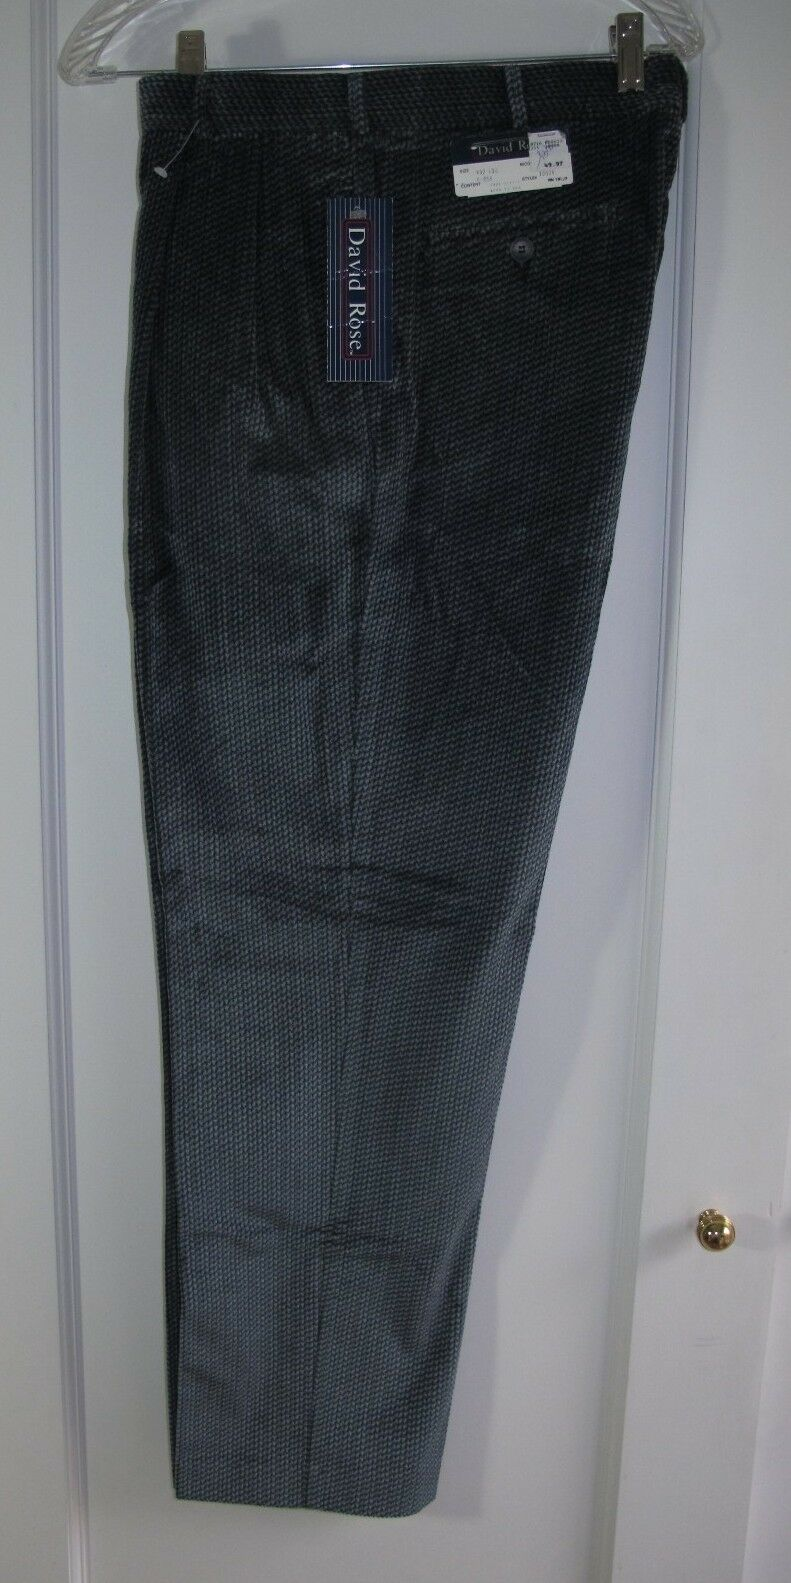 bluee Cotton Corduroy Pleated Pants Mens 32W 30L Herringbone DAVID pink USA Made